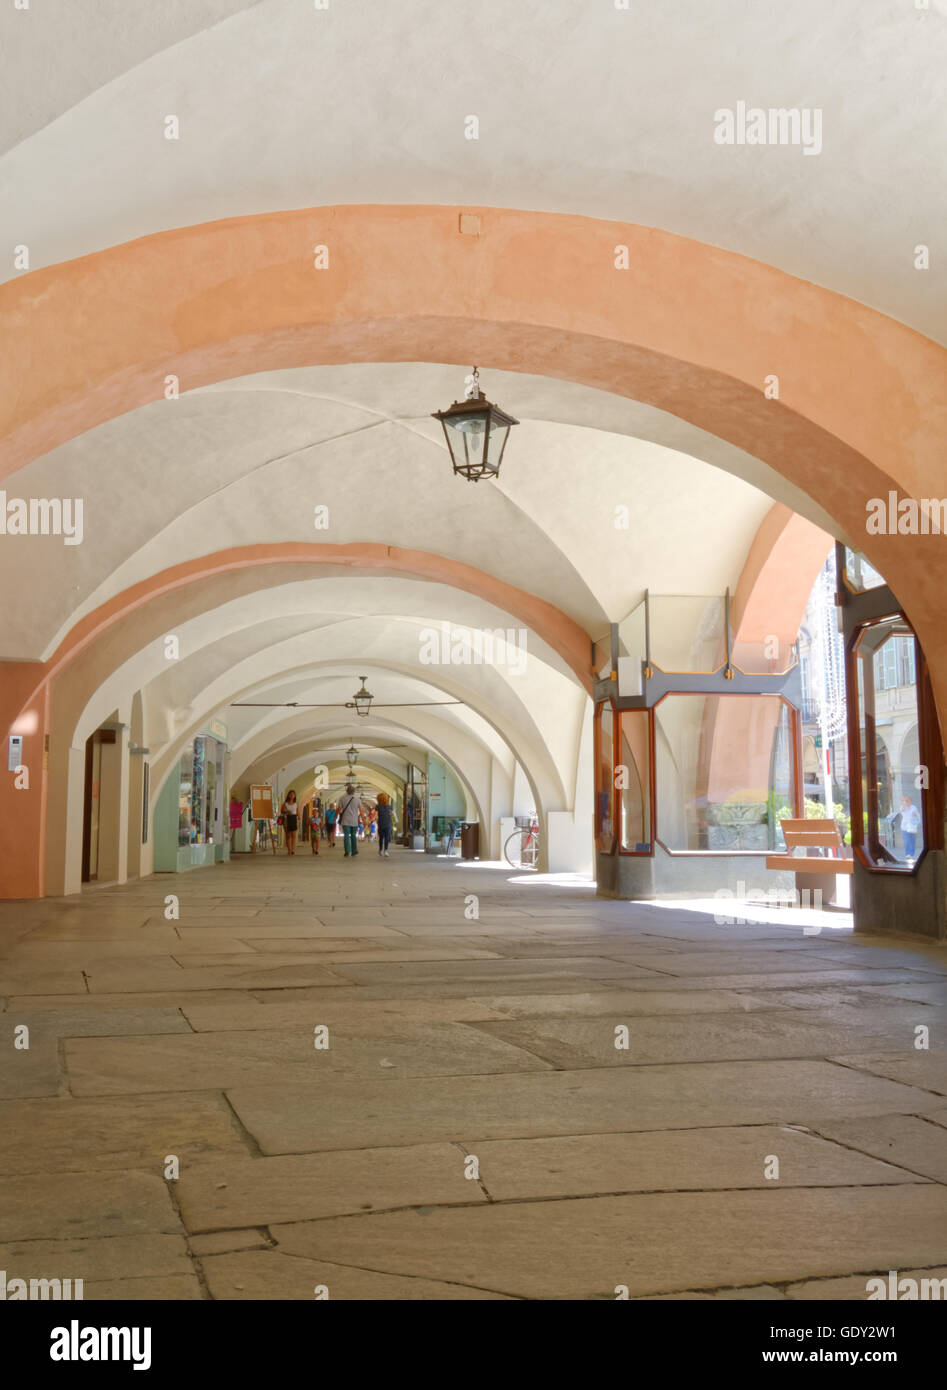 Arcades - Via Roma - Cuneo Stock Photo